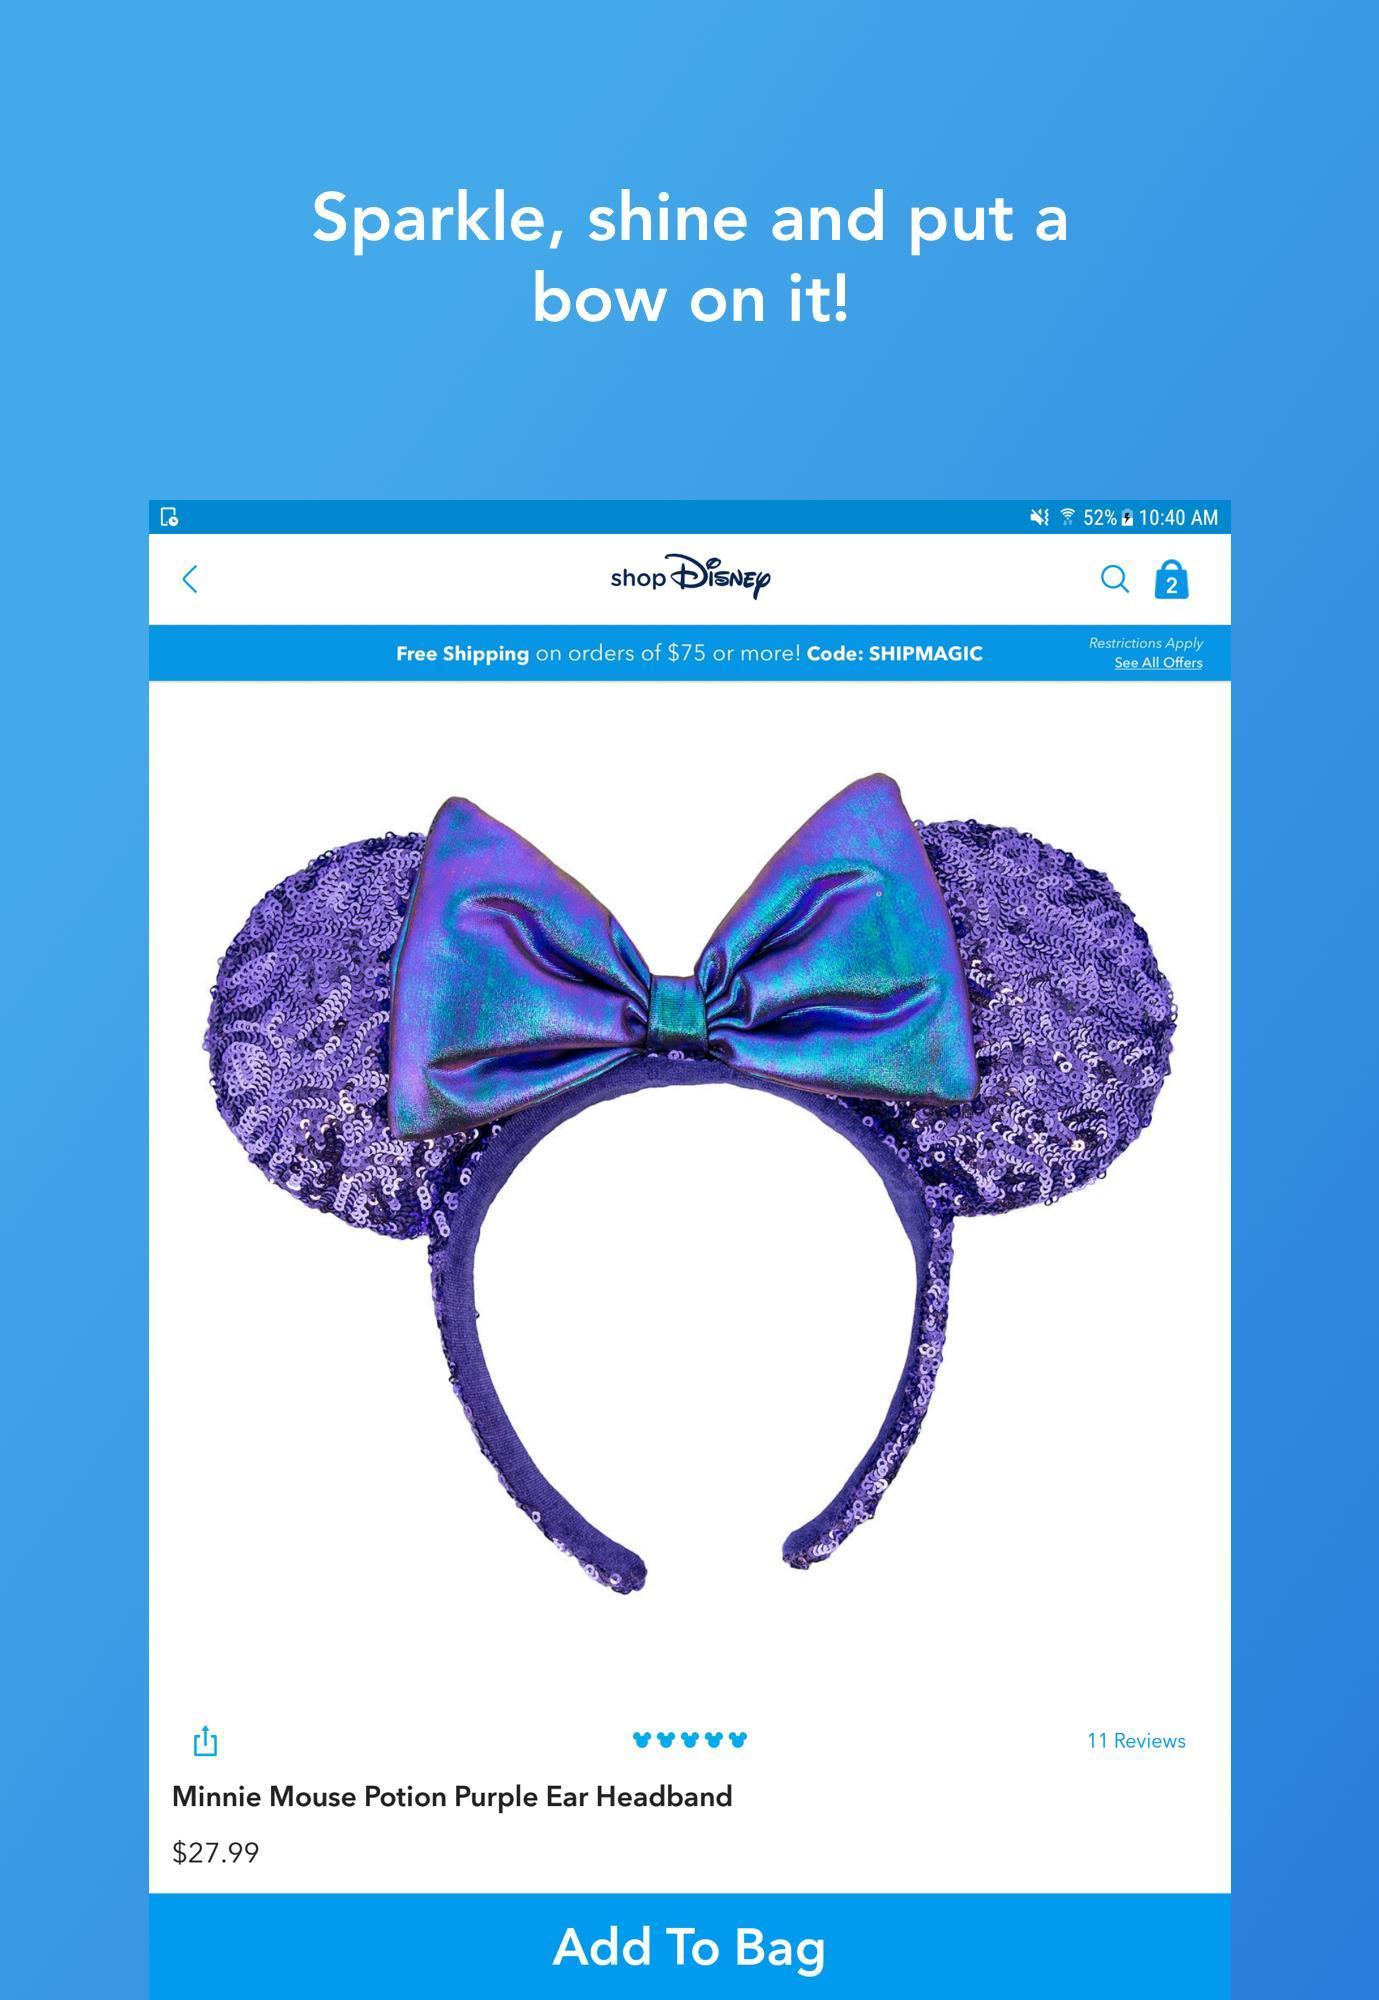 Shop Disney 3.1.1 Screenshot 9